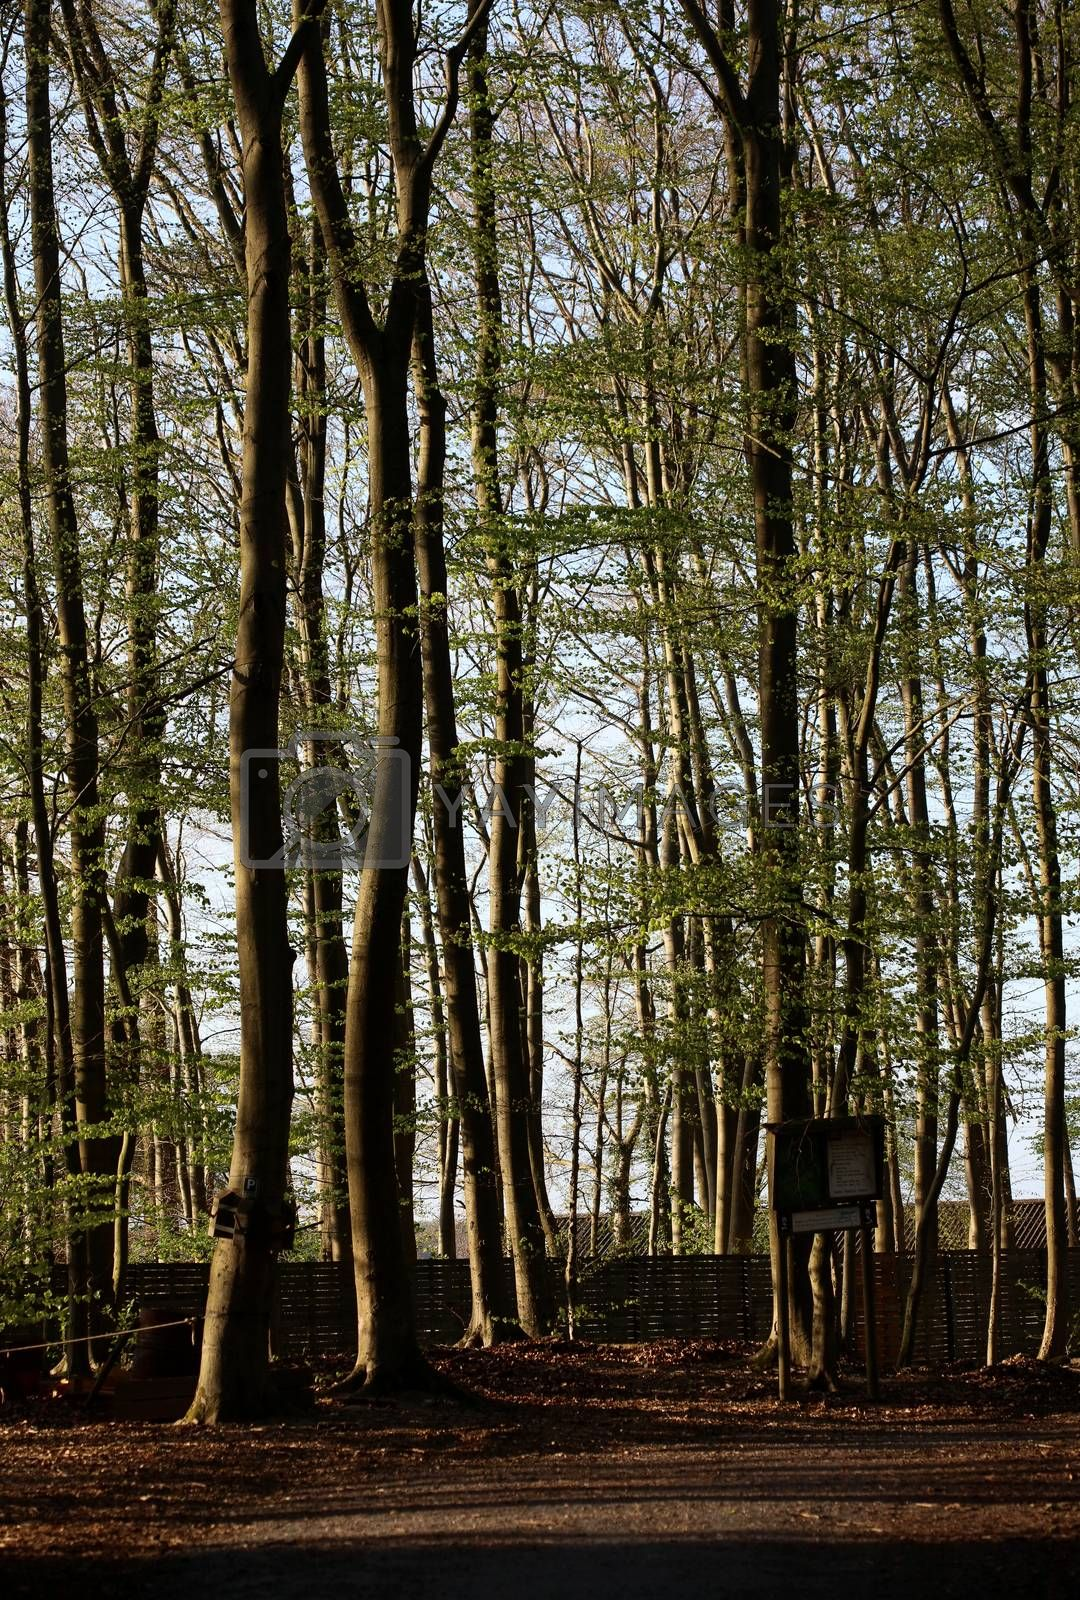 Haltern am see, germany, tuesday 21 april 2020 kletterwald man alone modeling covid-19 season background prints